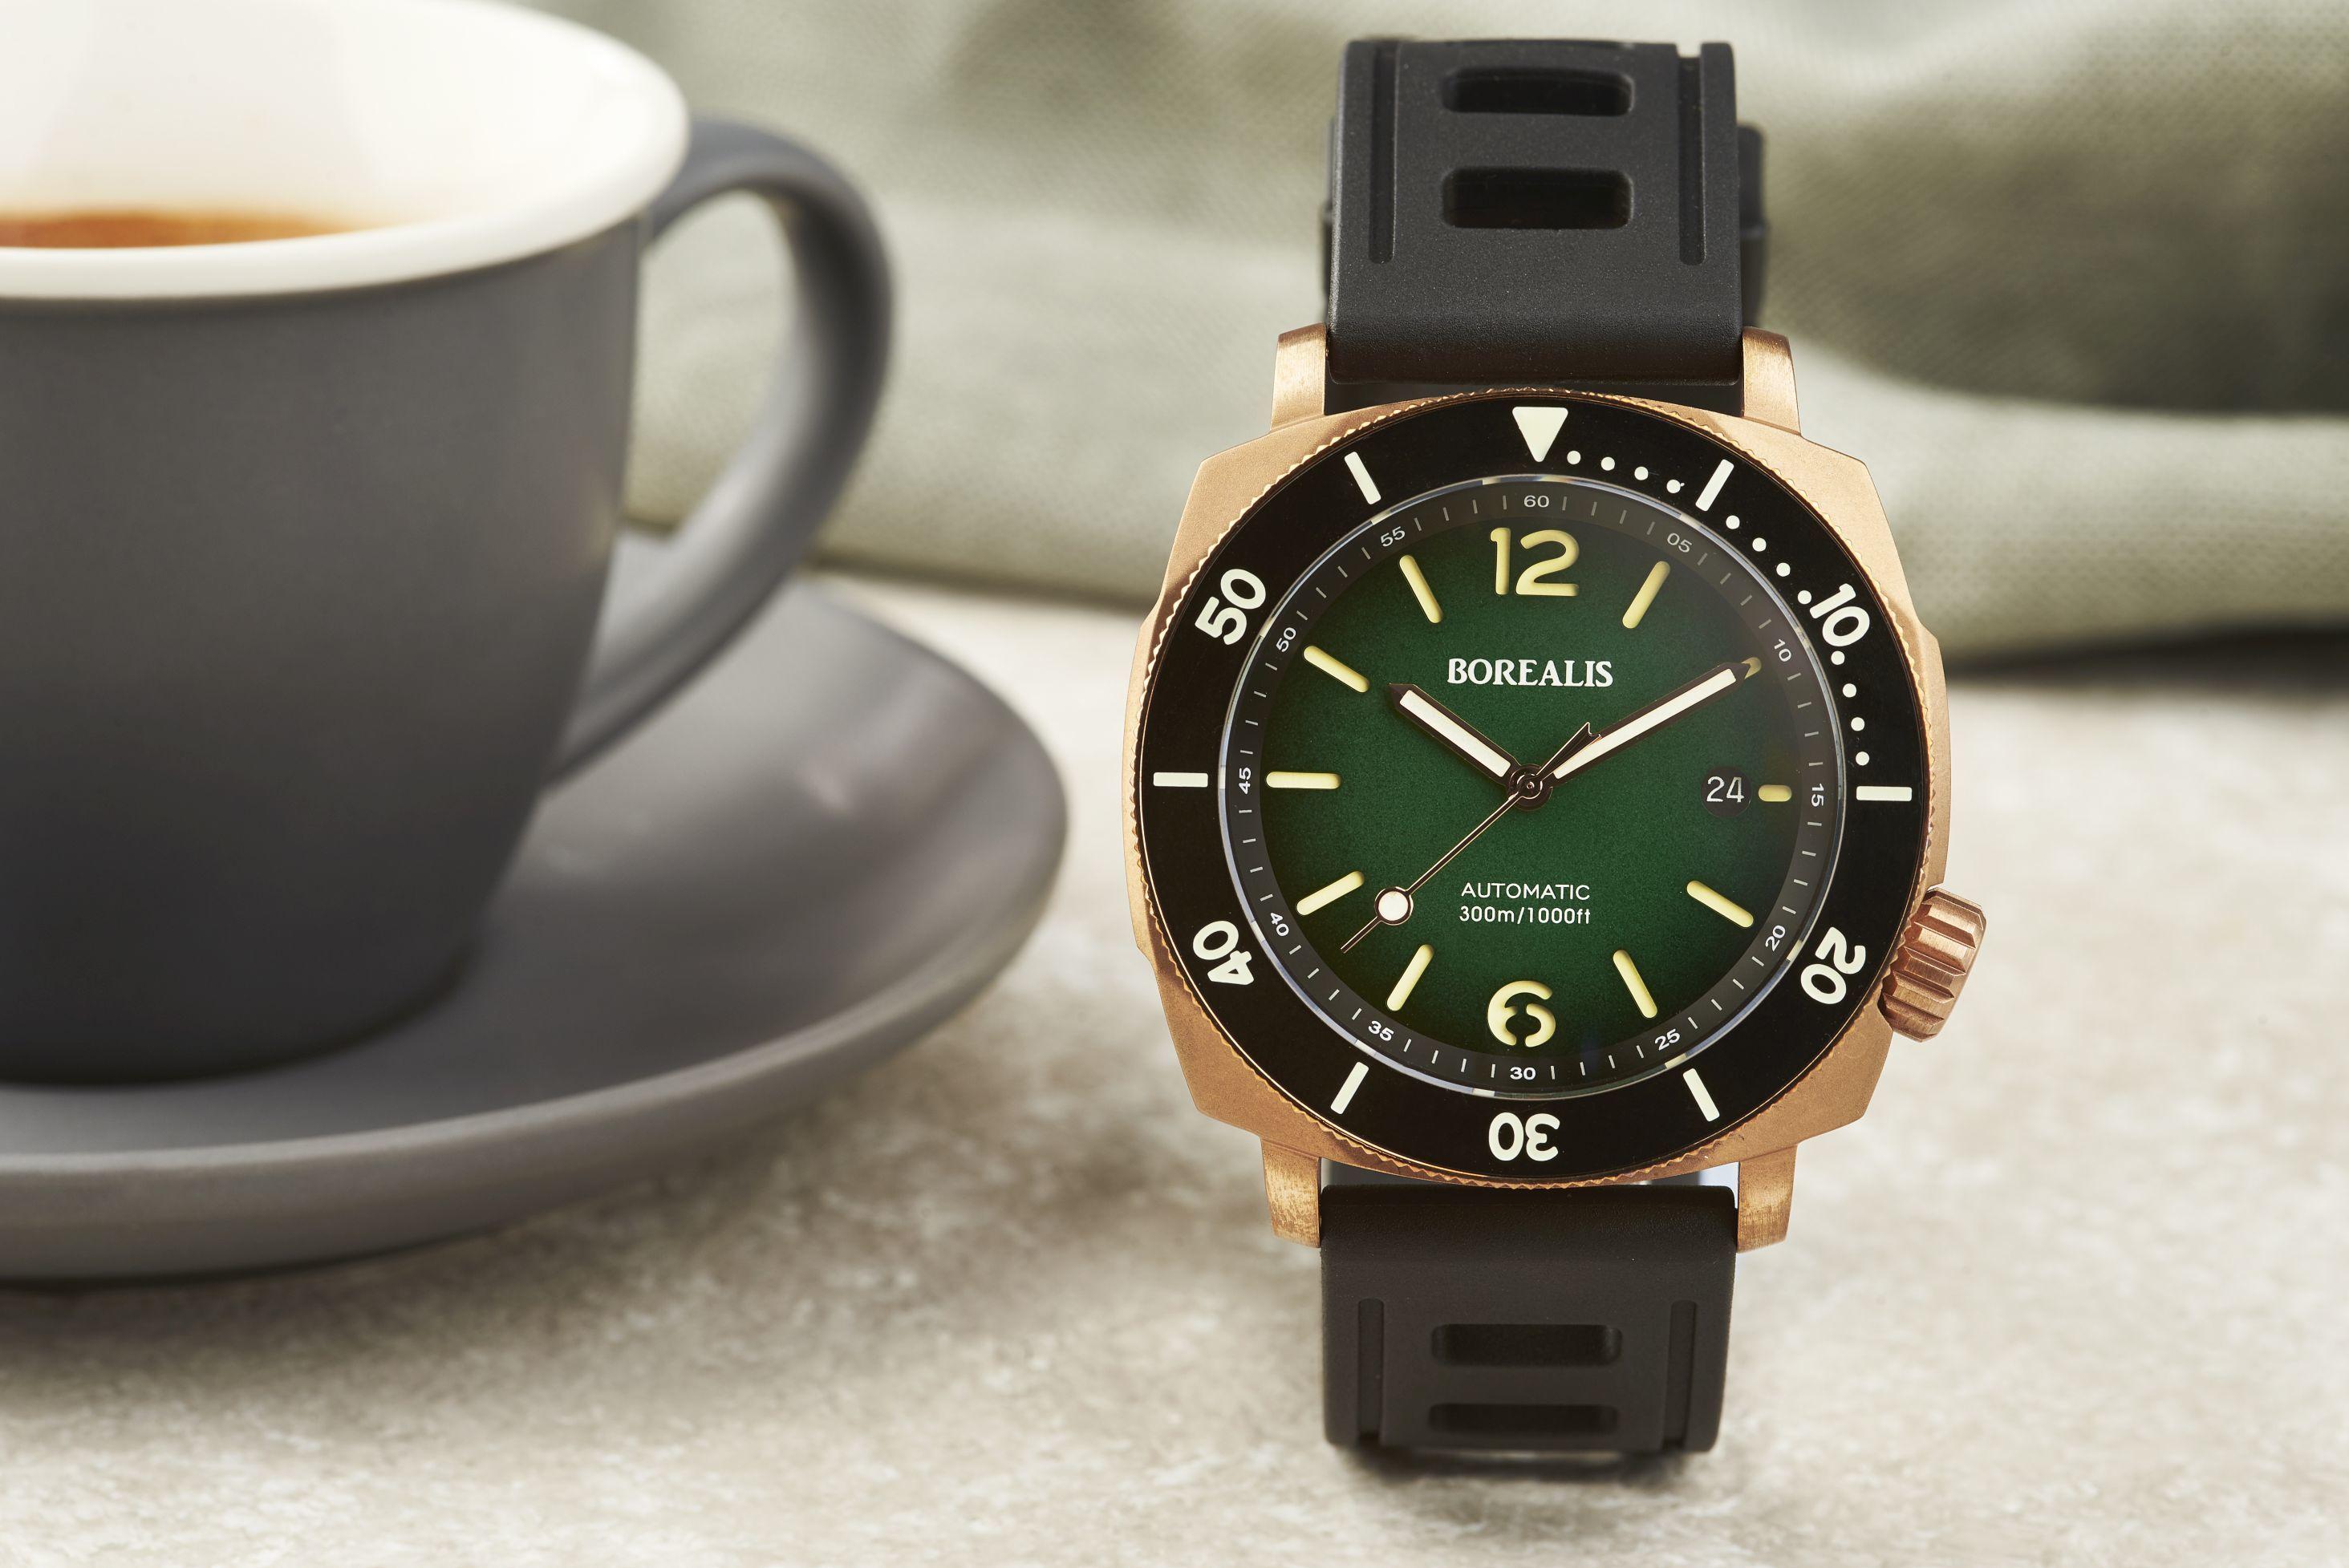 Borealis Navale CuSn8 Bronze 300m Diver Watch Miyota 9015 Green Fumed Dial Version ER Rotating Bezel